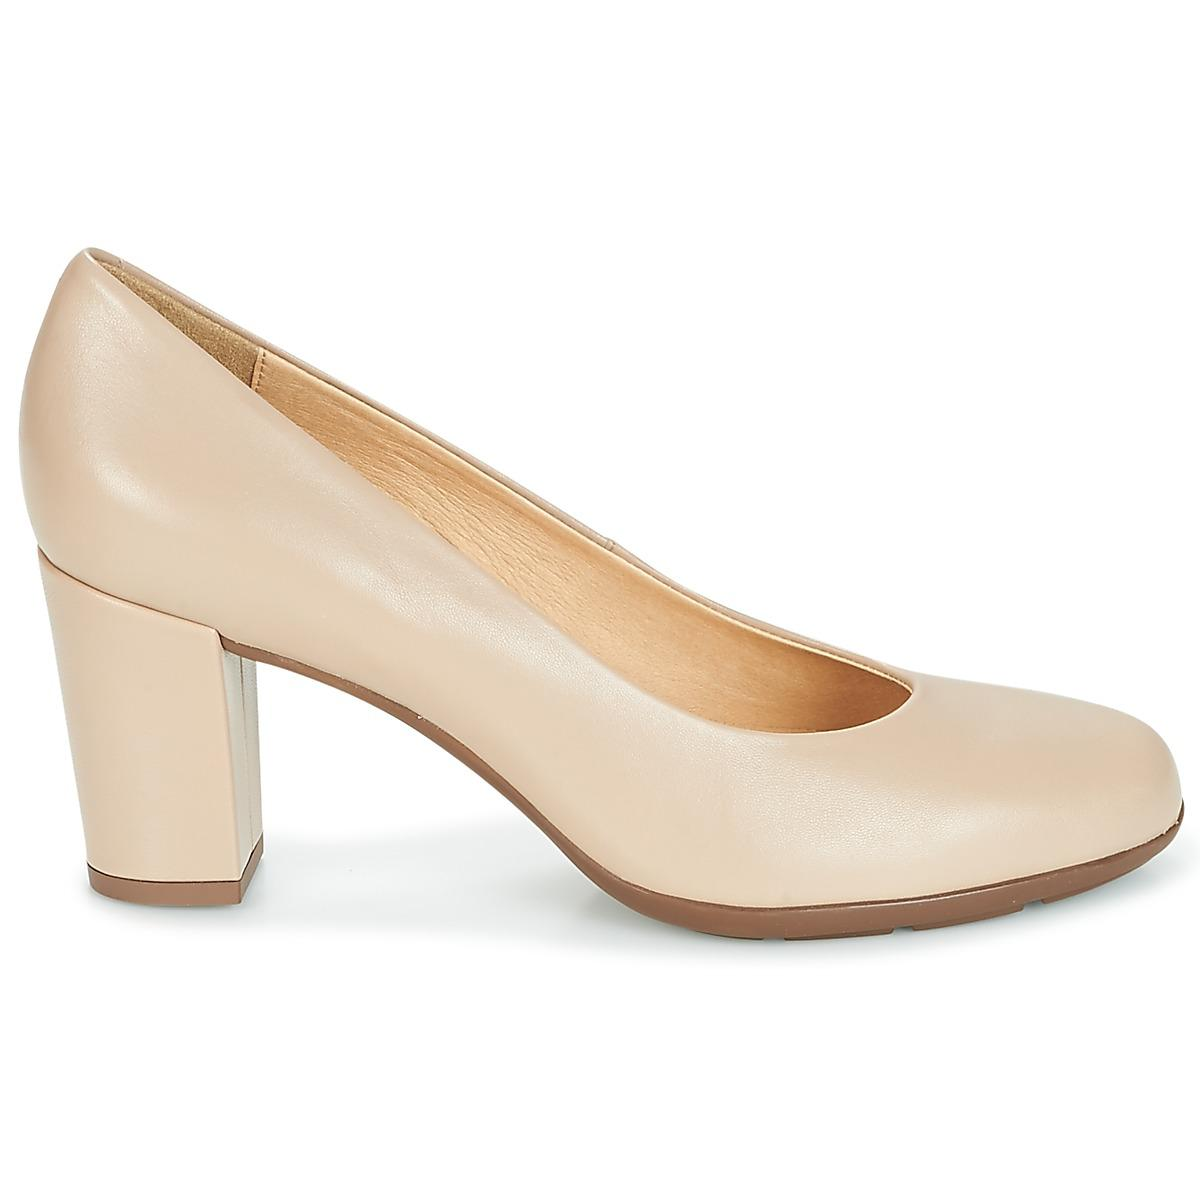 Geox - Natural Annya C Women's Court Shoes In Beige - Lyst. View fullscreen